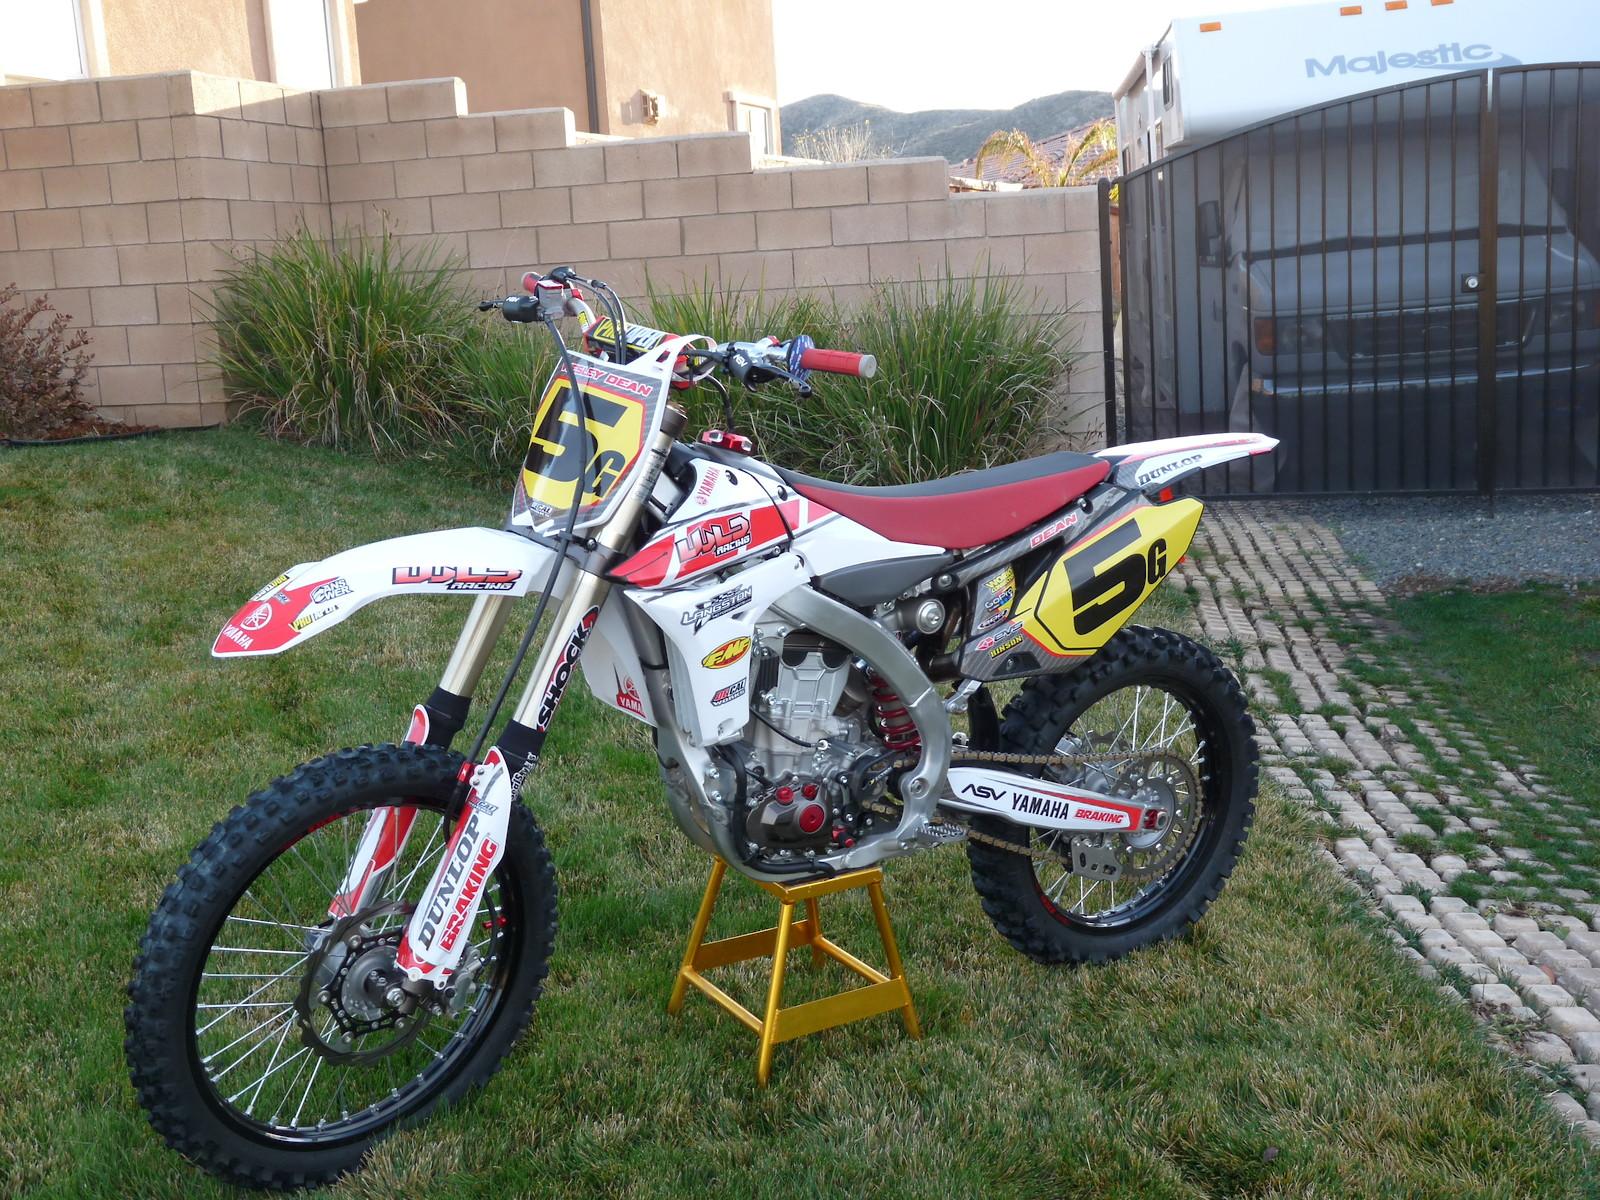 P1230519 - WLD - Motocross Pictures - Vital MX